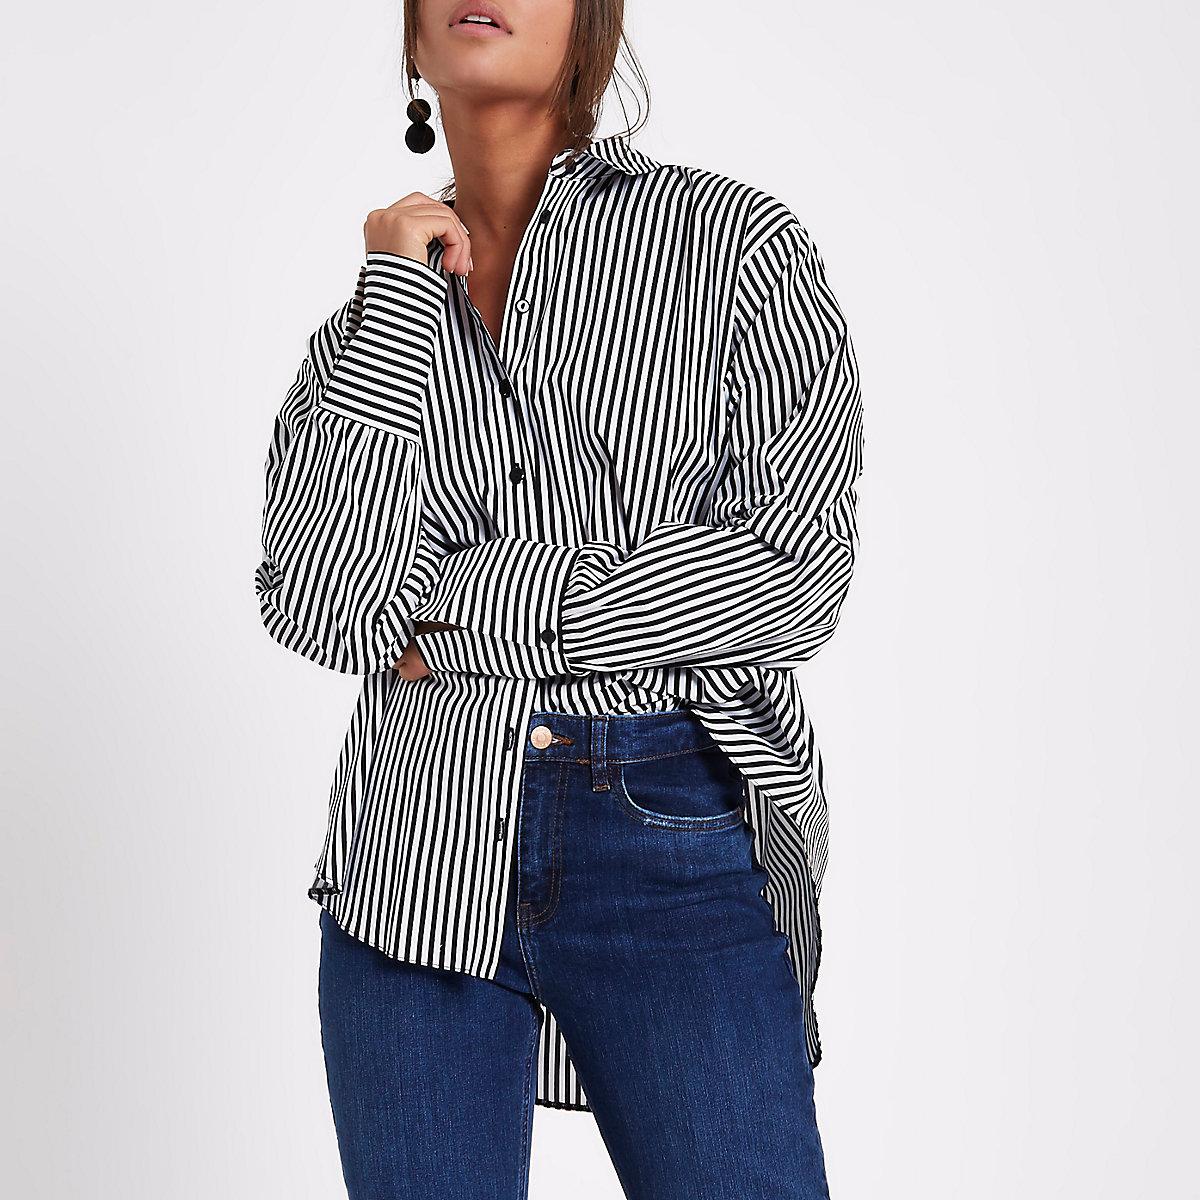 Schwarzes, gestreiftes Hemd